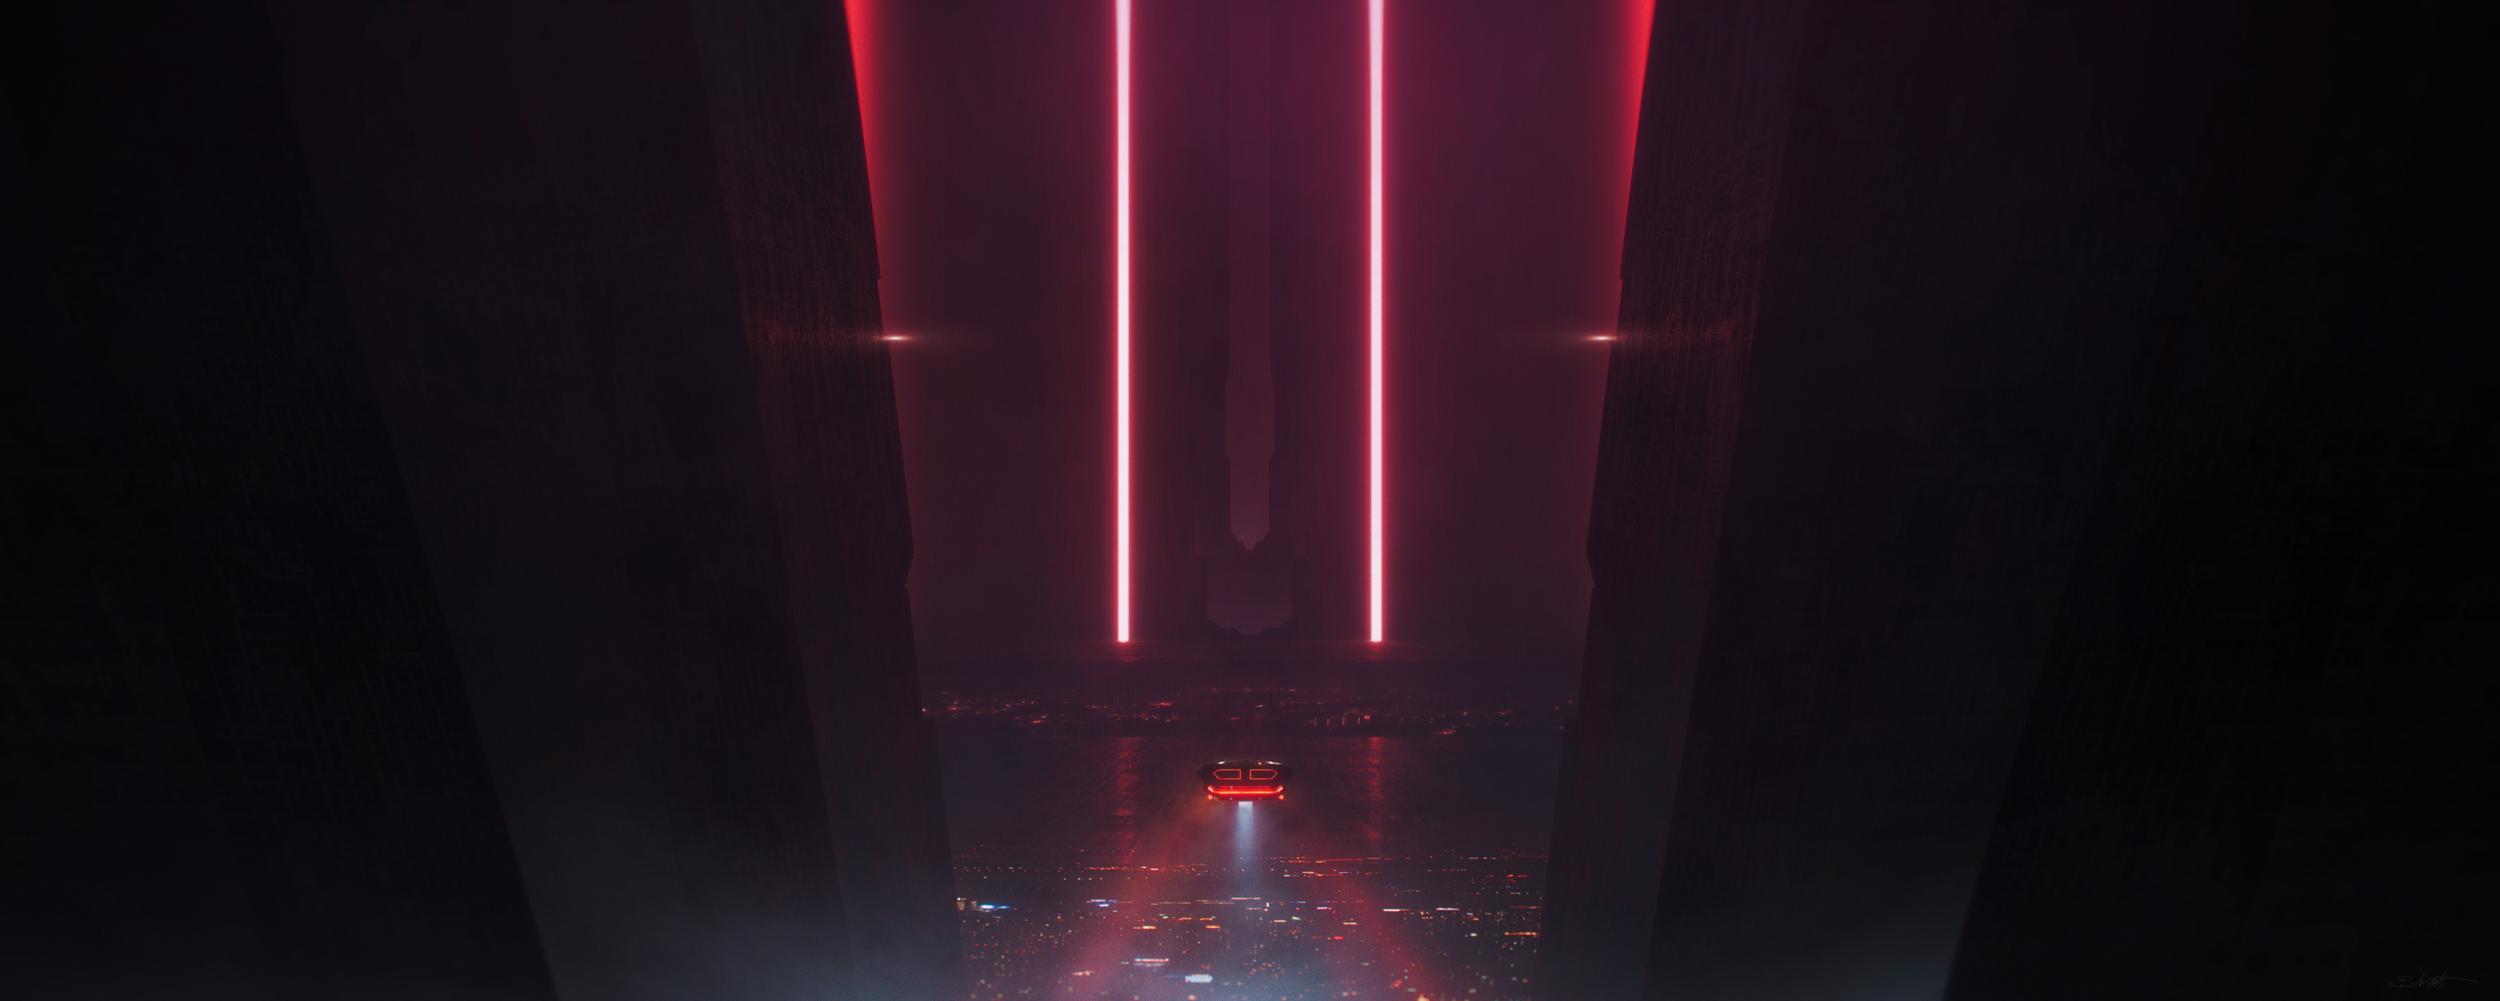 Blade Runner 2049 Tribute 1 By Grivetart 2500x1000 Wallpapers